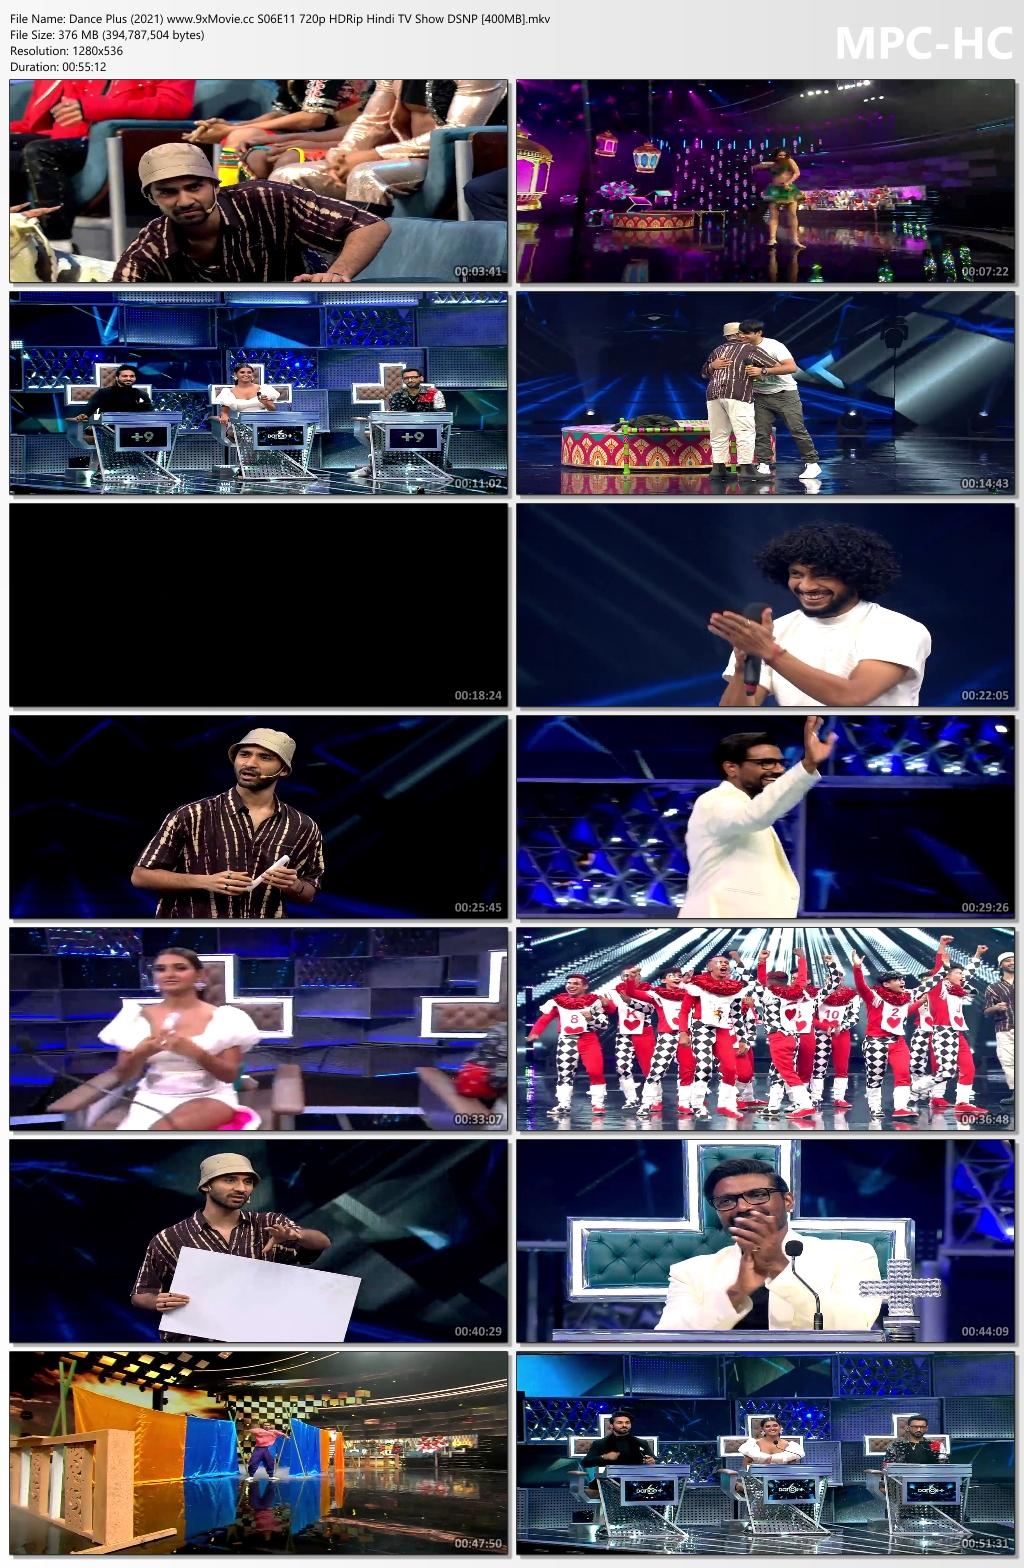 Dance-Plus-2021-www-9x-Movie-cc-S06-E11-720p-HDRip-Hindi-TV-Show-DSNP-400-MB-mkv